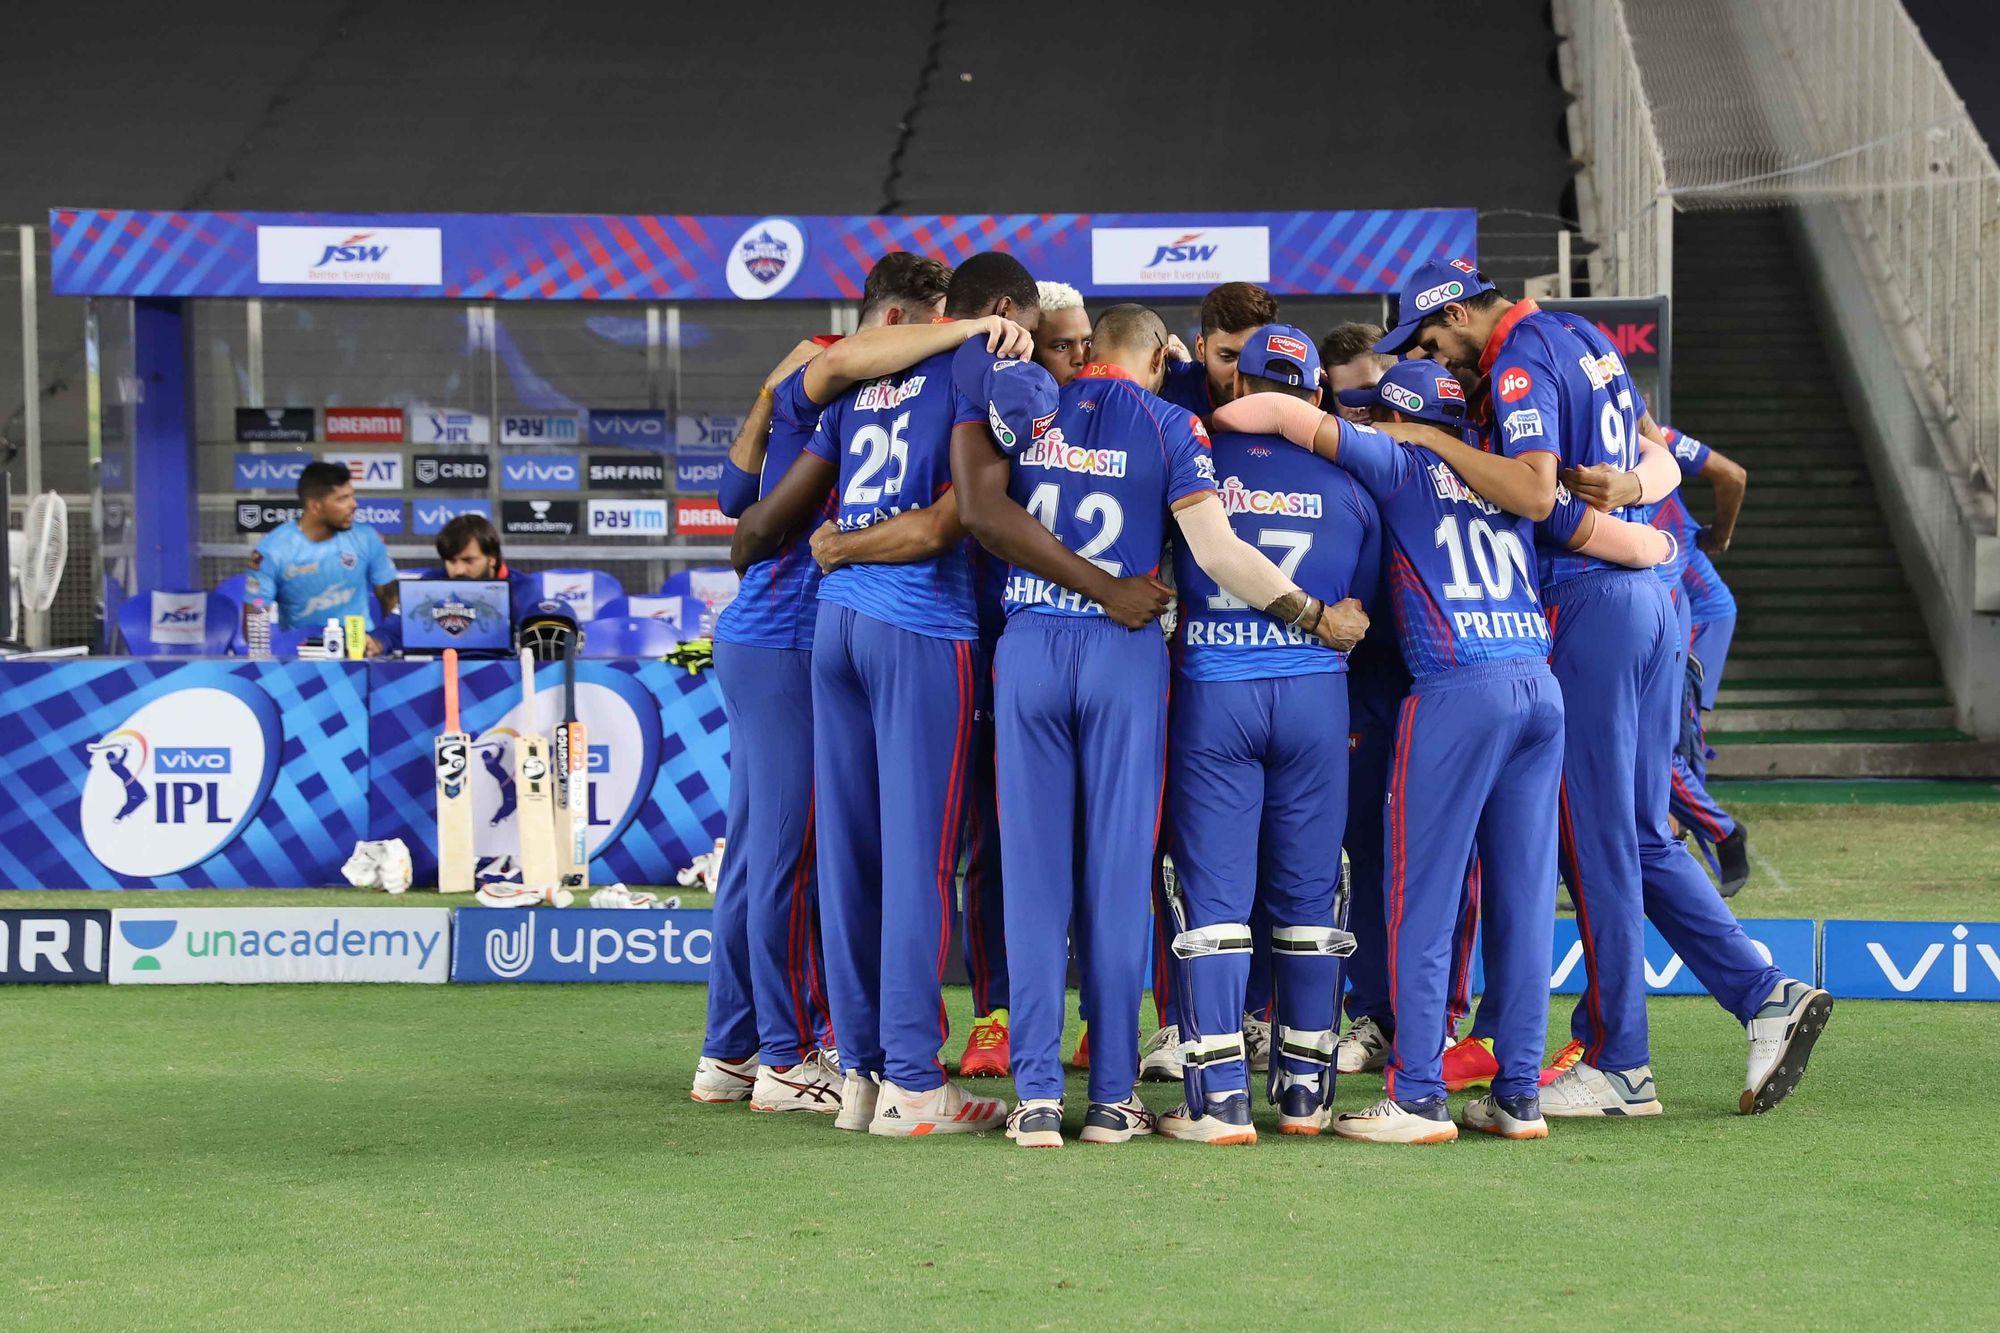 Rabad hopes DC win the IPL trophy this season | BCCI/IPL